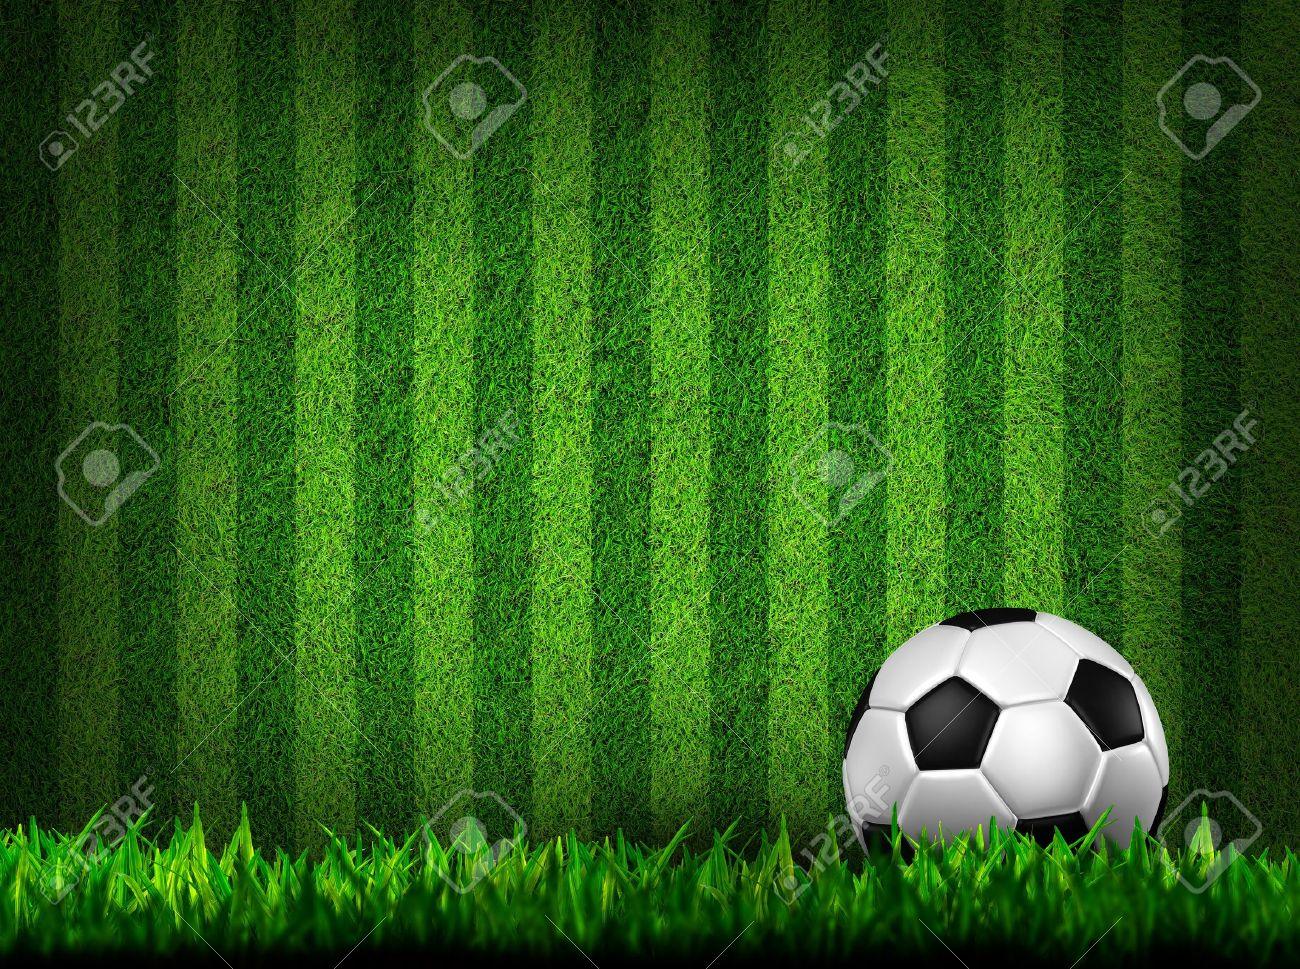 soccer football on grass field Stock Photo - 10090190